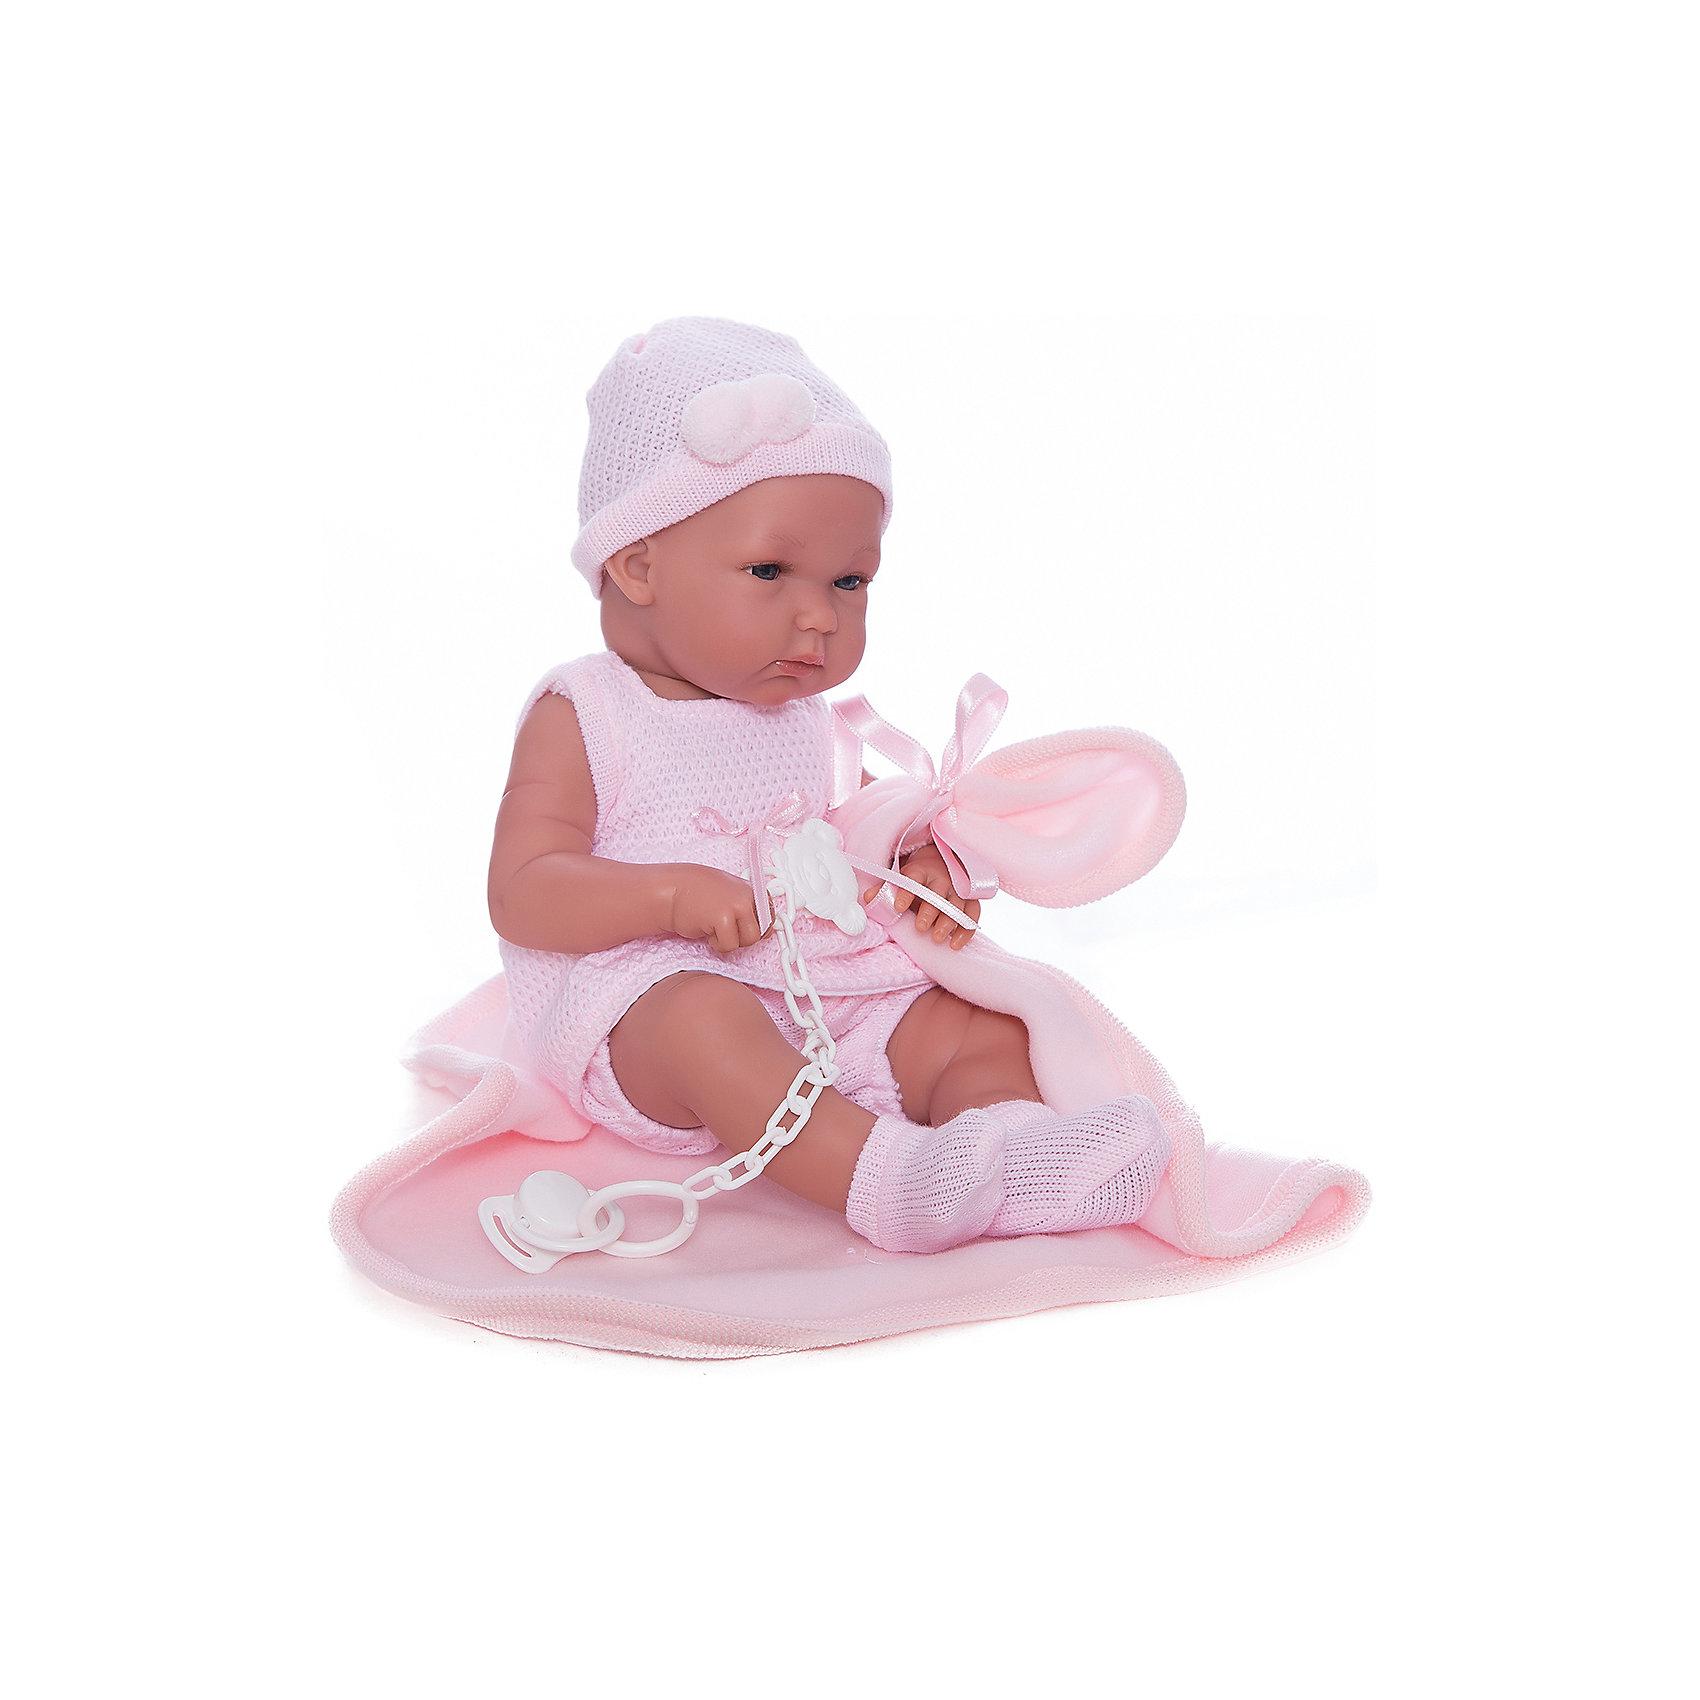 Llorens Кукла Бимбас одеялом, 35 см, Llorens куклы и одежда для кукол llorens кукла изабела 33 см со звуком